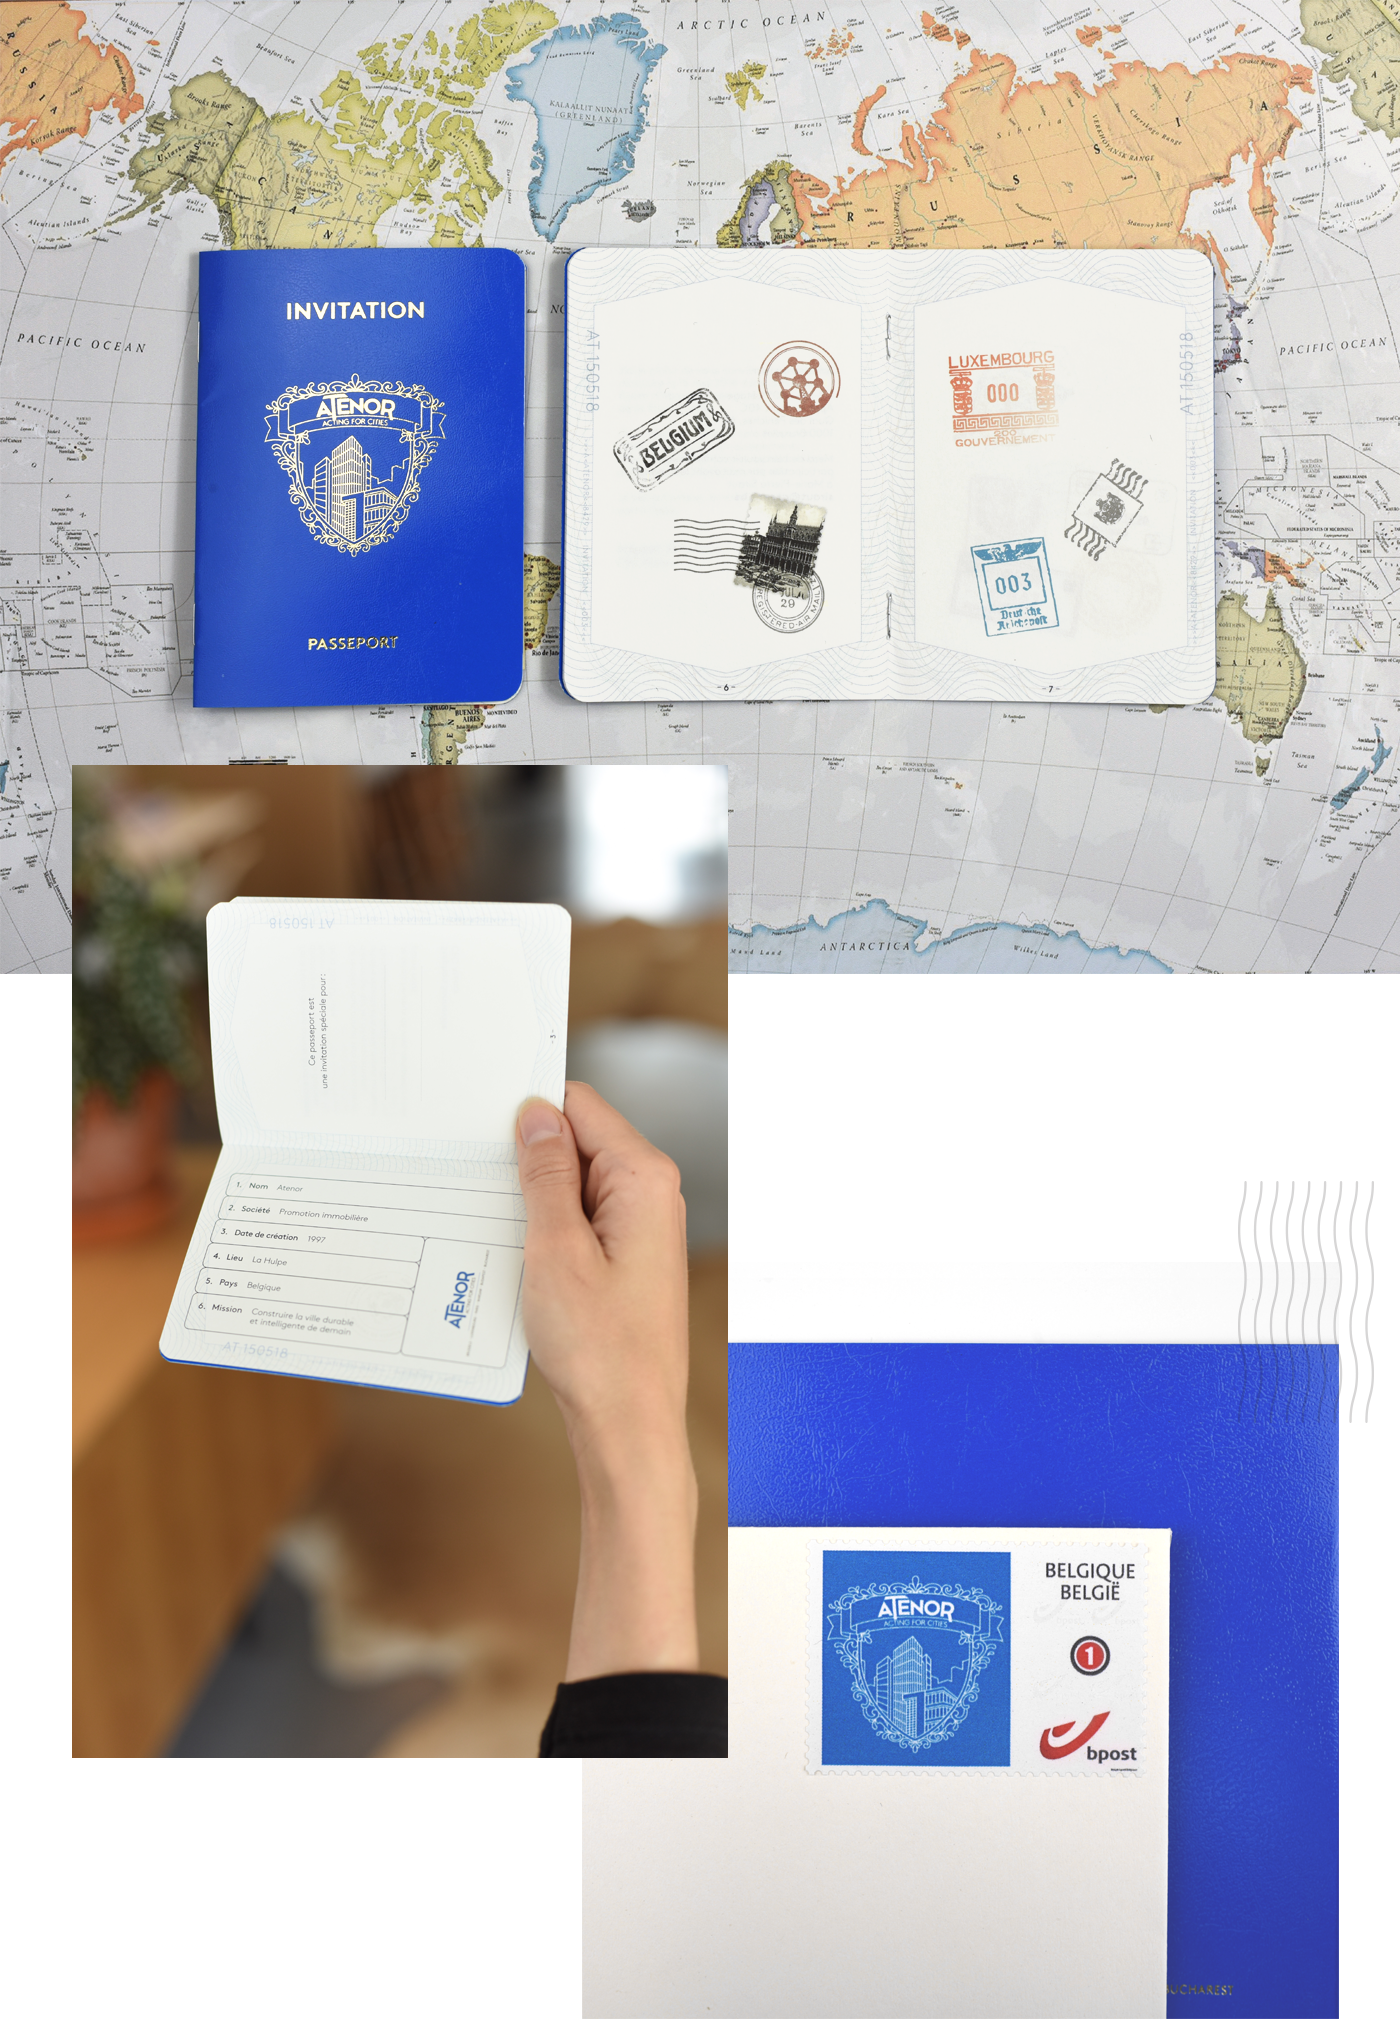 passport atenor on world map